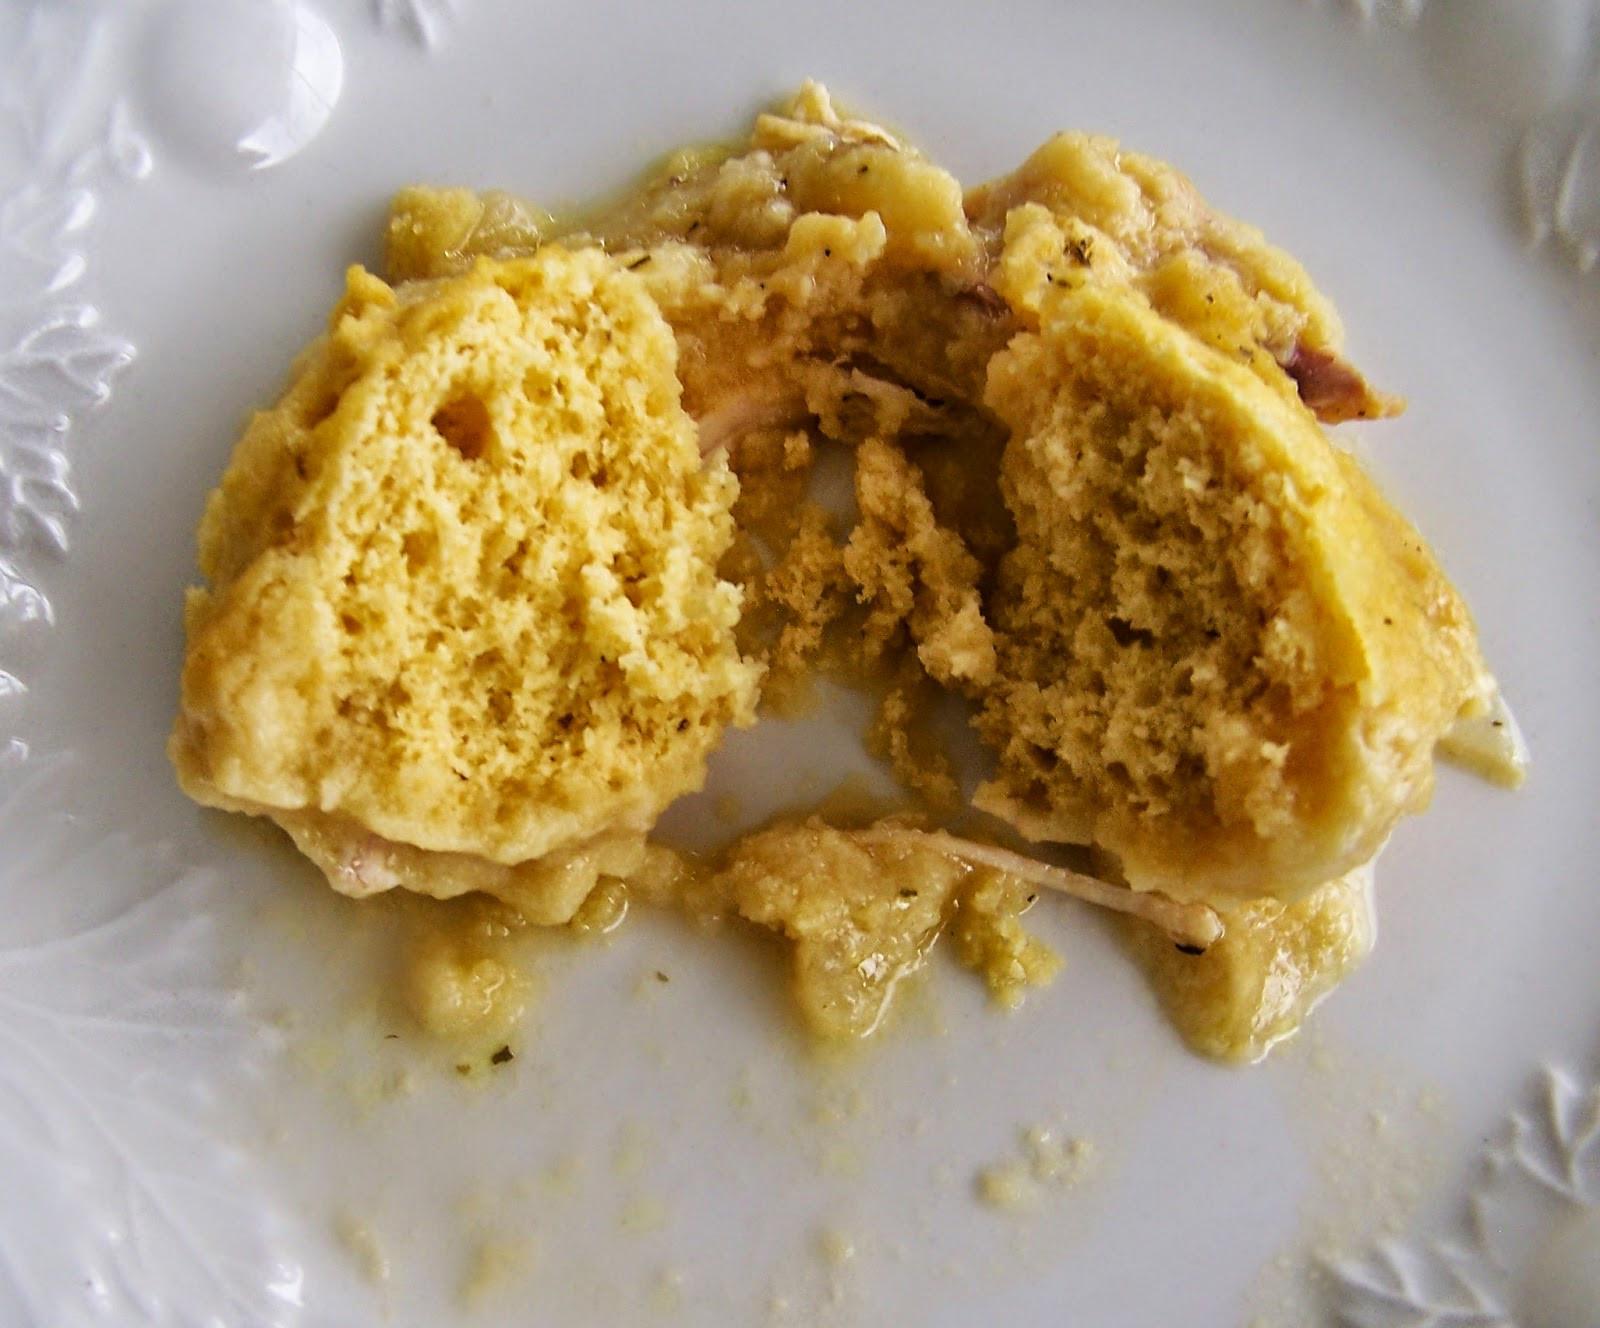 Low Carb Dumplings  Gluten Free Chicken and Fluffy Low Carb Dumplings grain